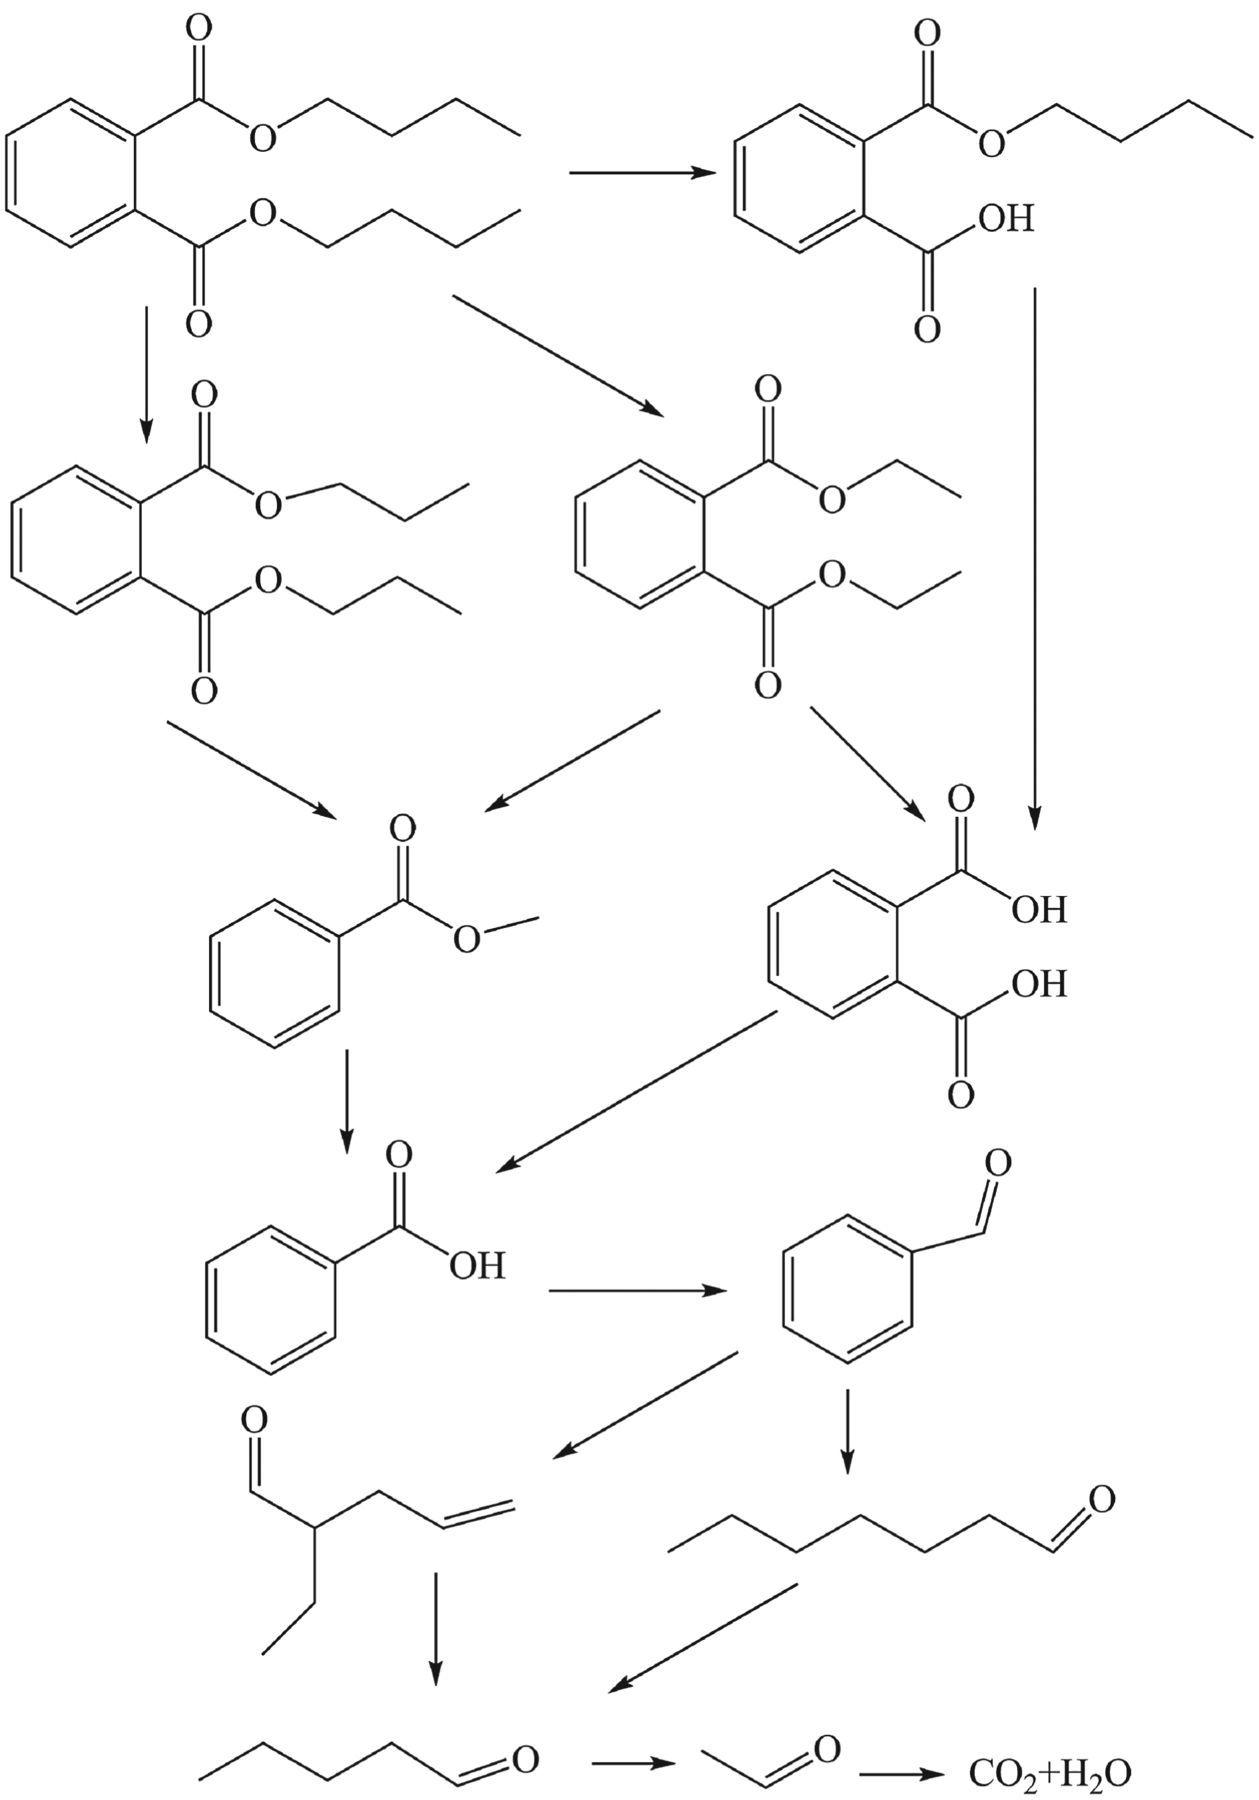 Photocatalytic degradation properties of α-Fe2O3